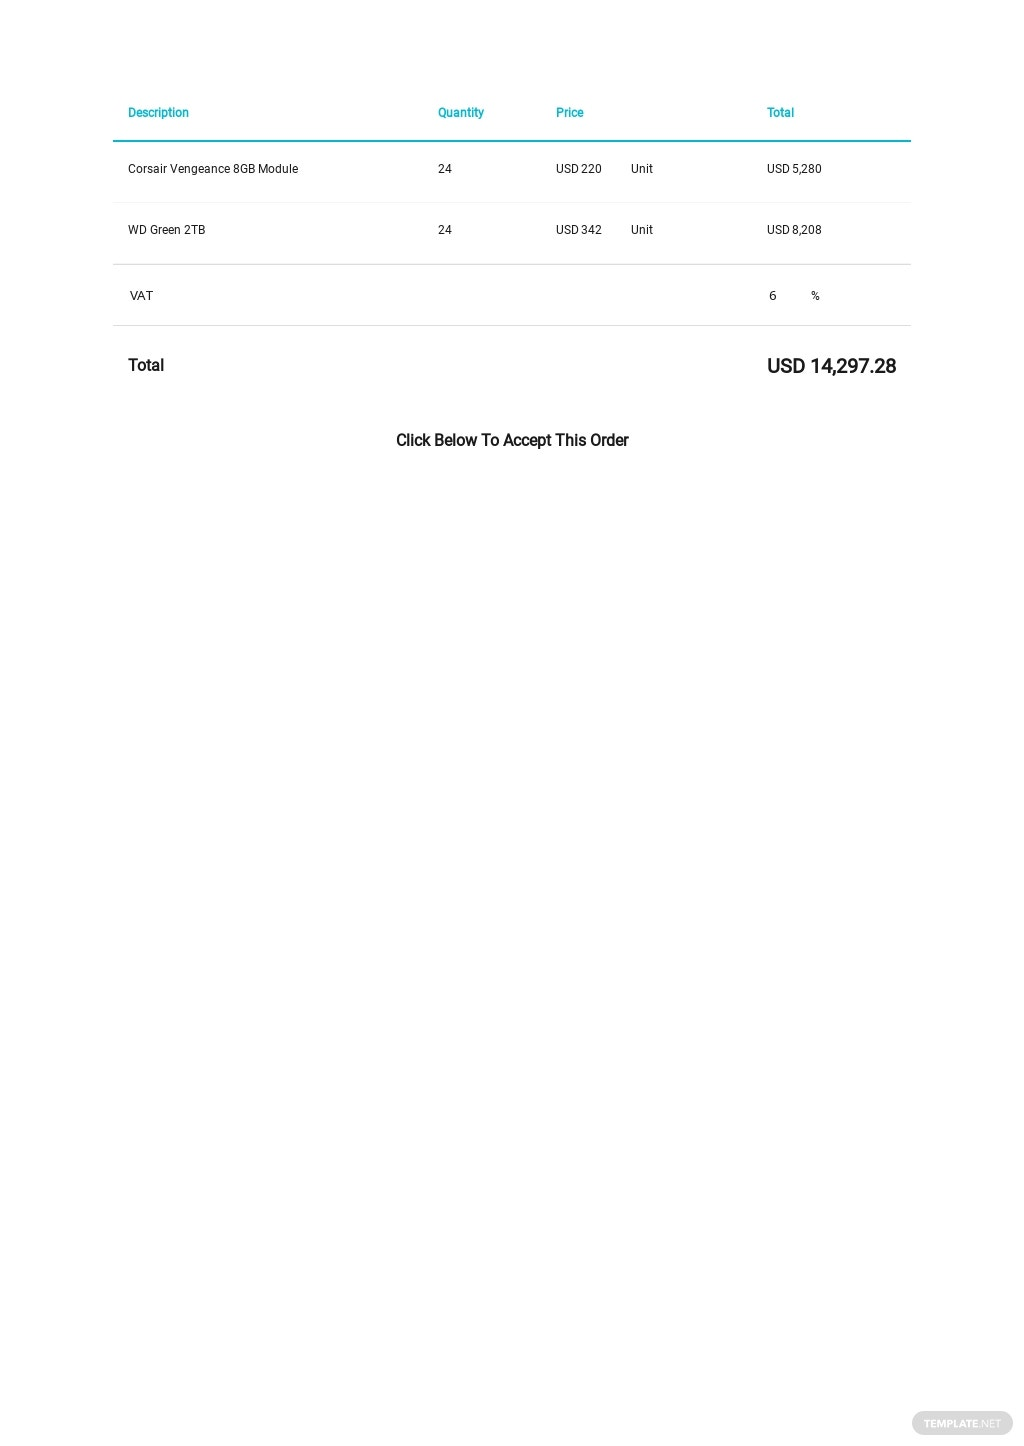 Change Order Request Summary